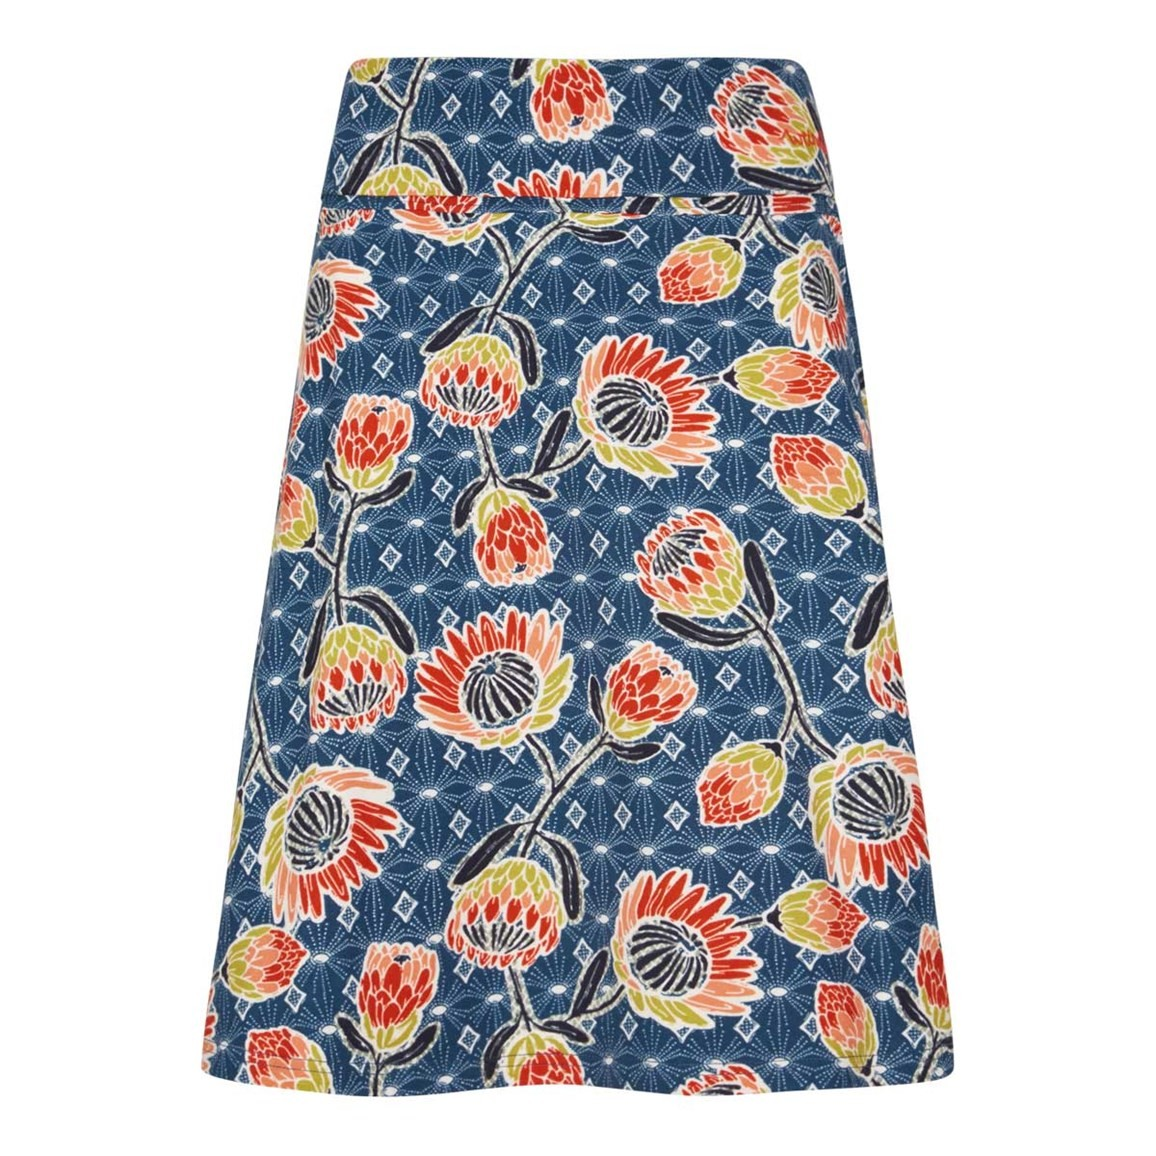 Weird Fish Malmo Printed Jersey Skirt Dark Navy Size 10